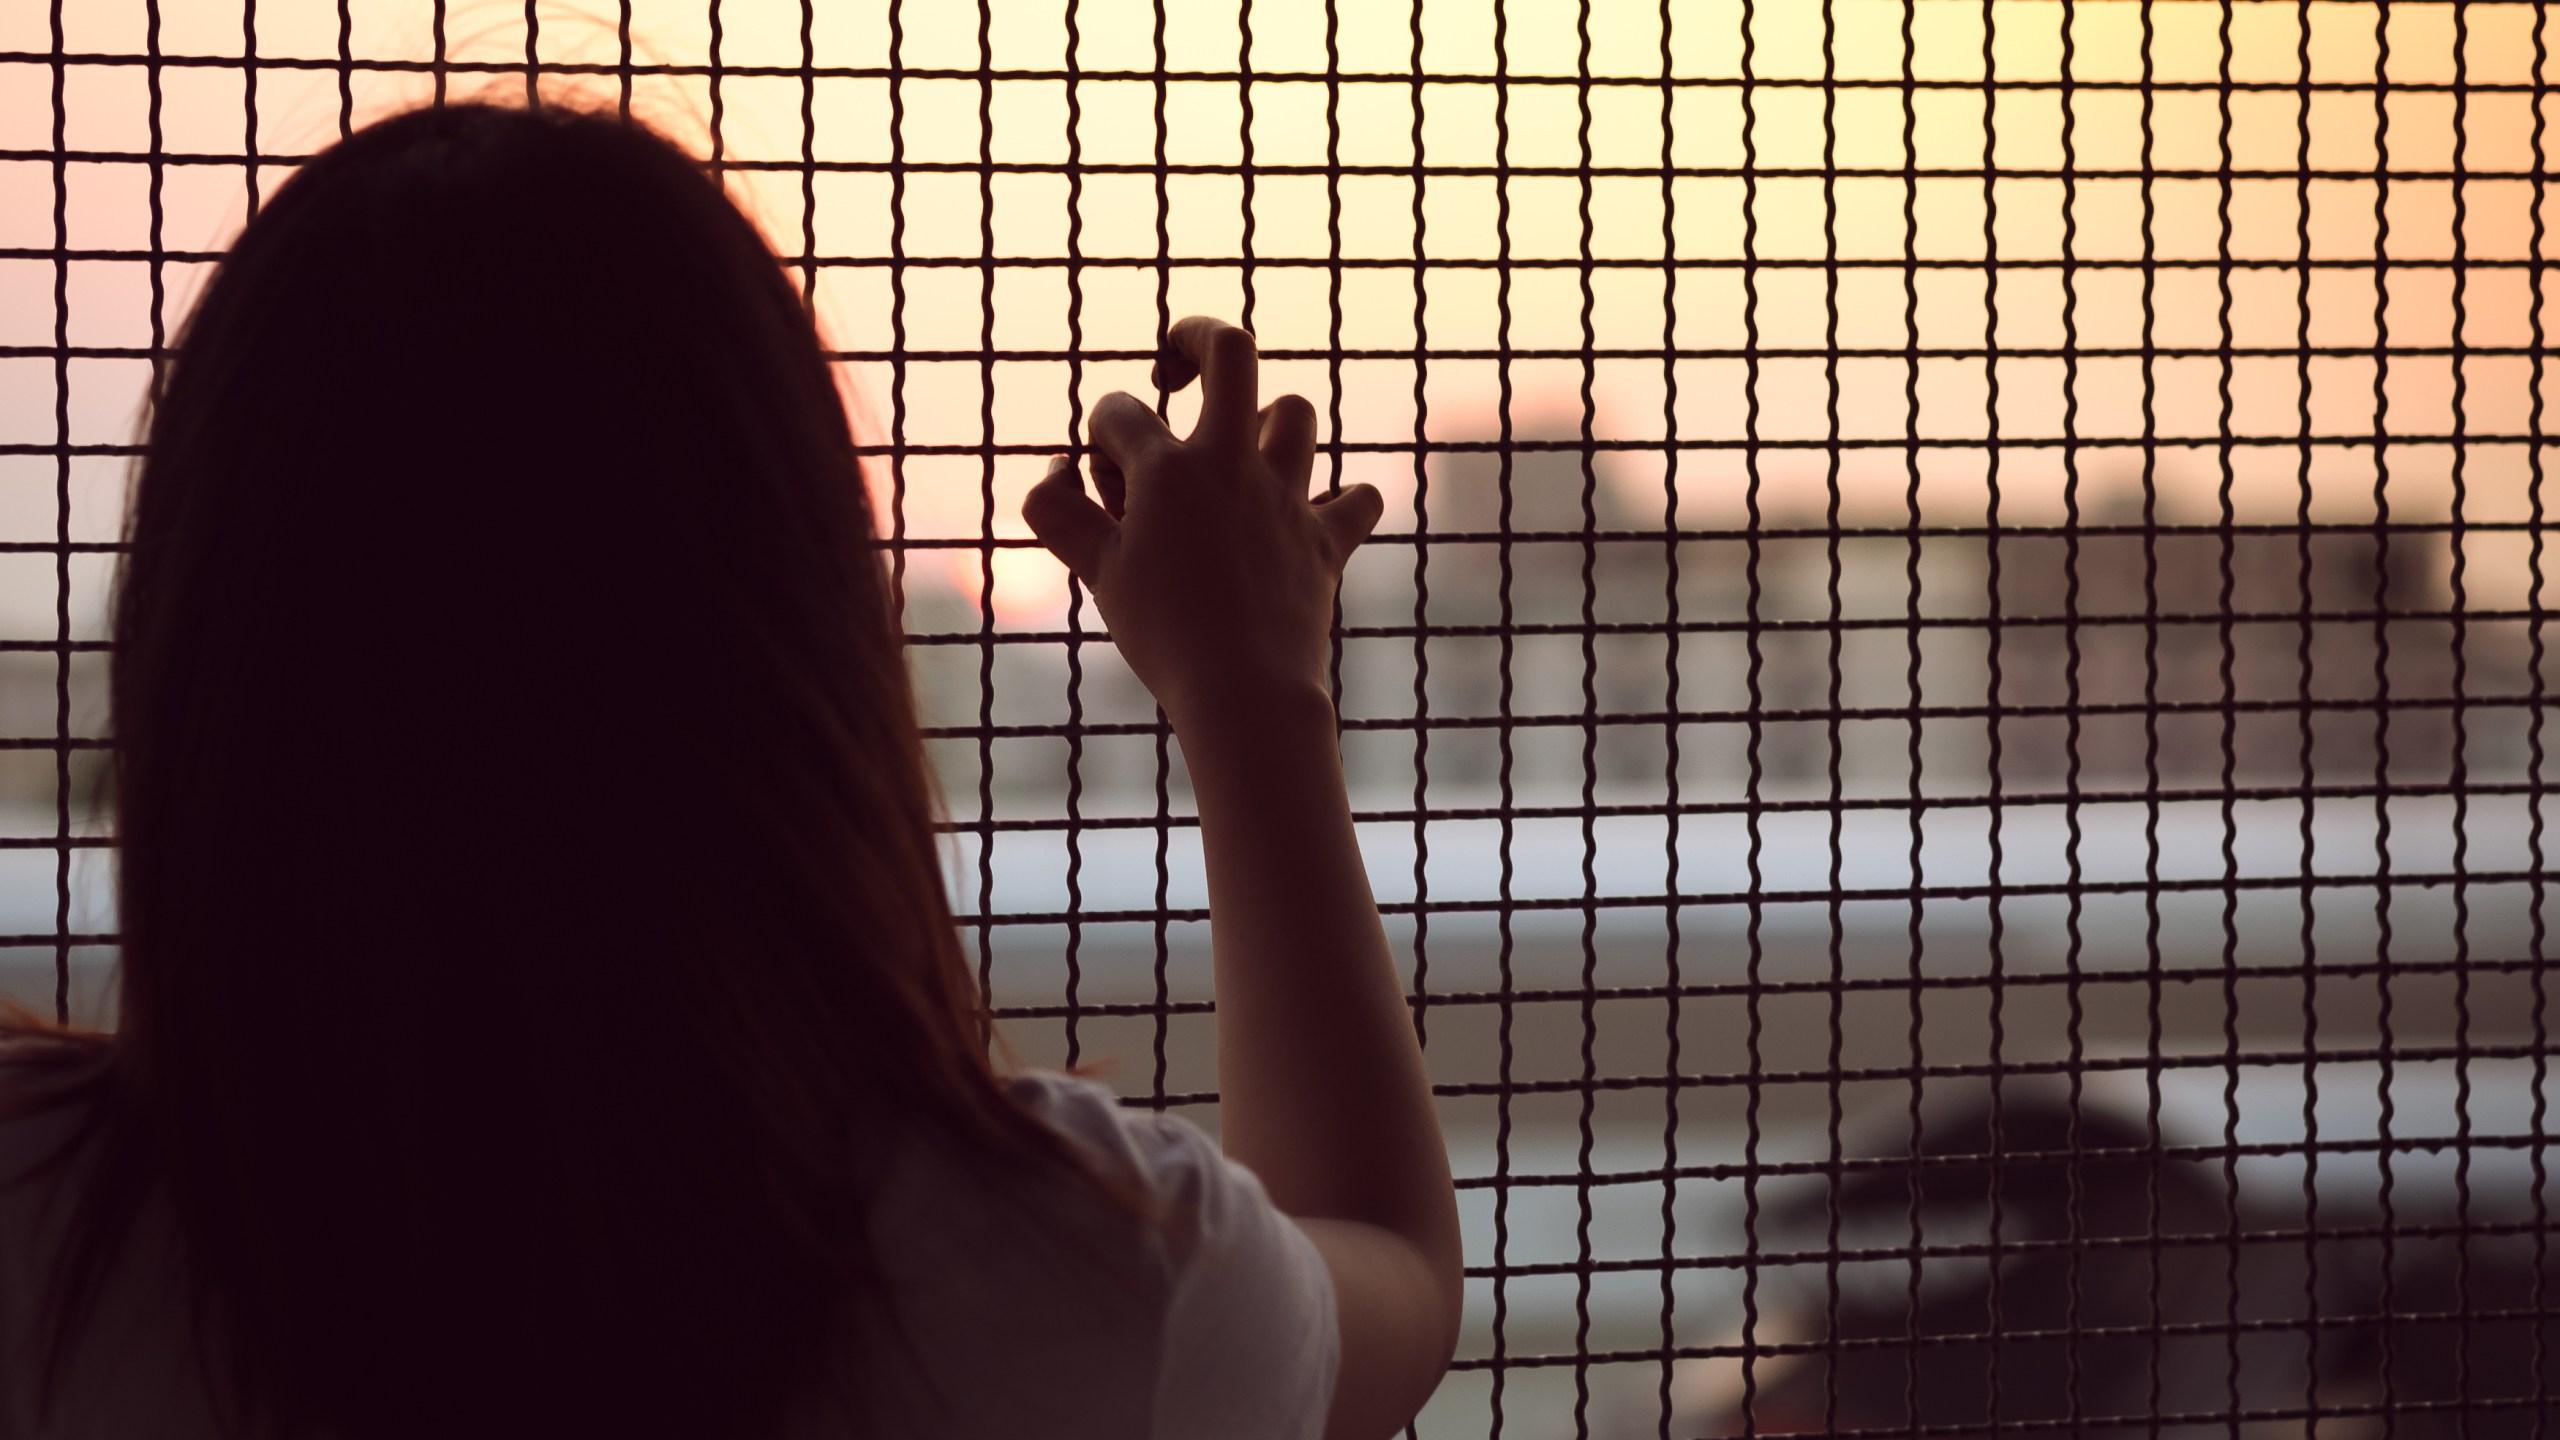 shutterstock_410319142 human sex trafficking prostitution_263927